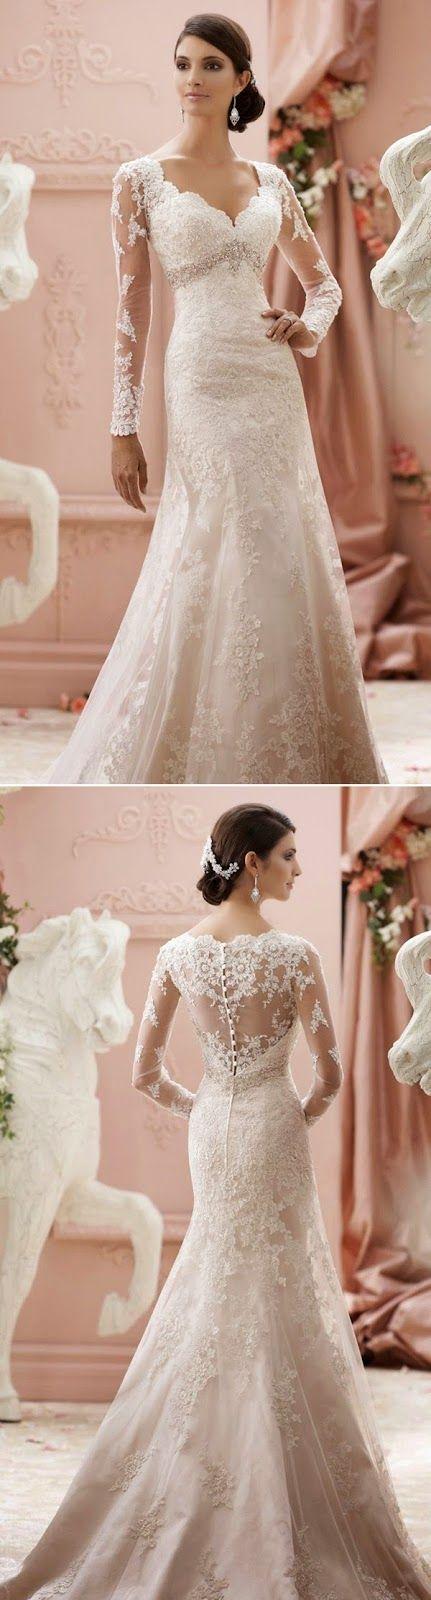 Top 5 long sleeve white dress